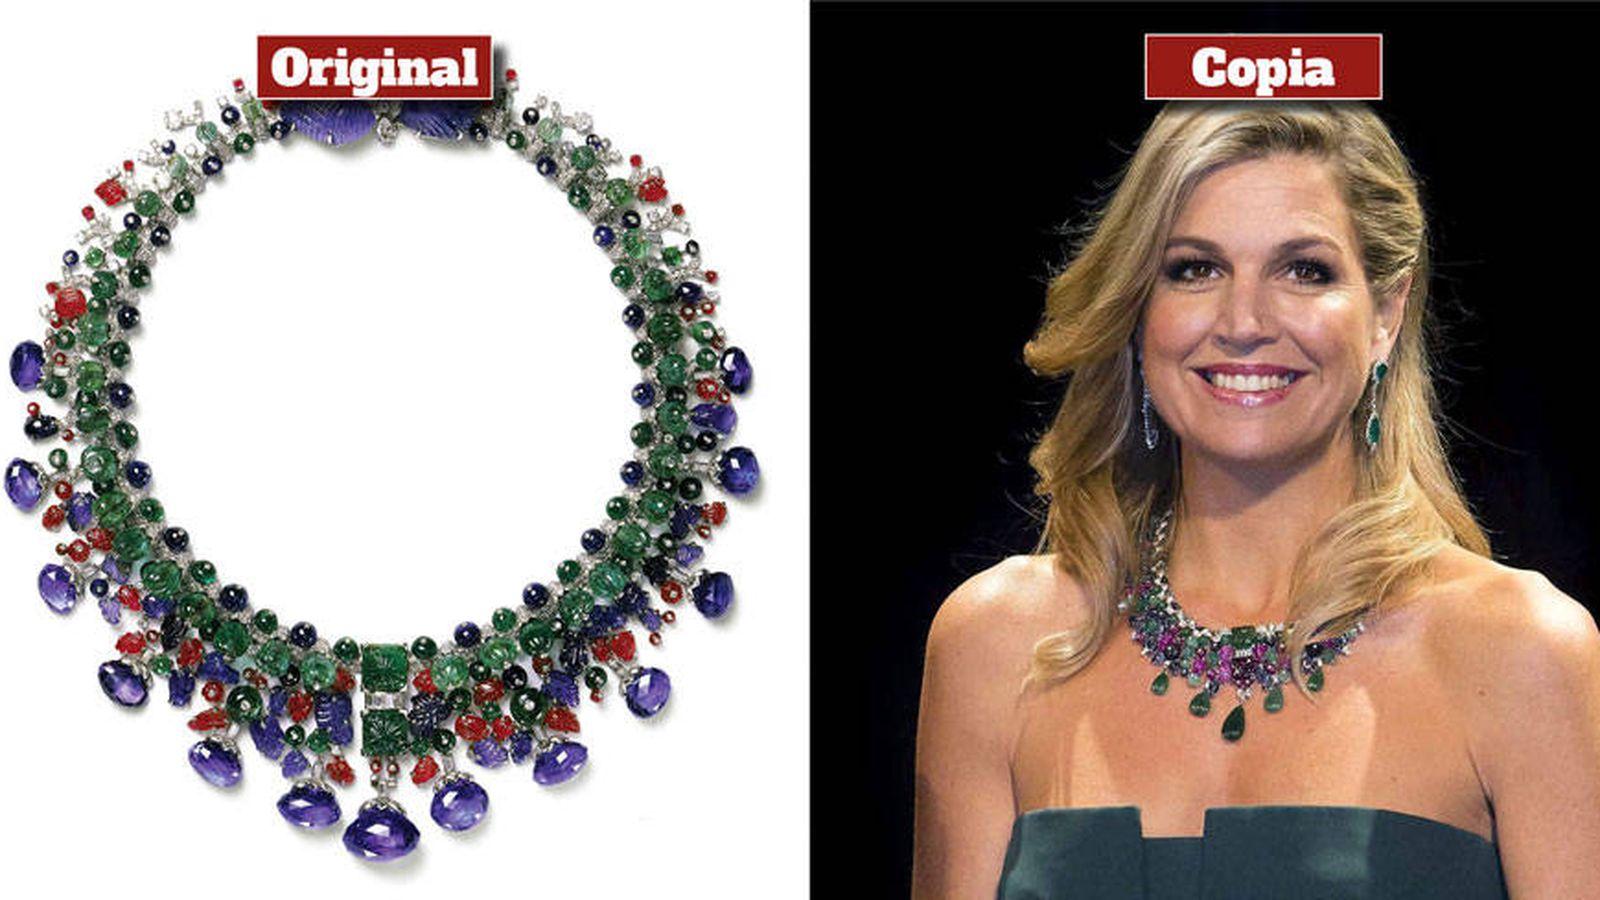 b26a345faf38 Familia Real de Holanda  El collar de imitación de Cartier que luce la reina  Máxima de Holanda